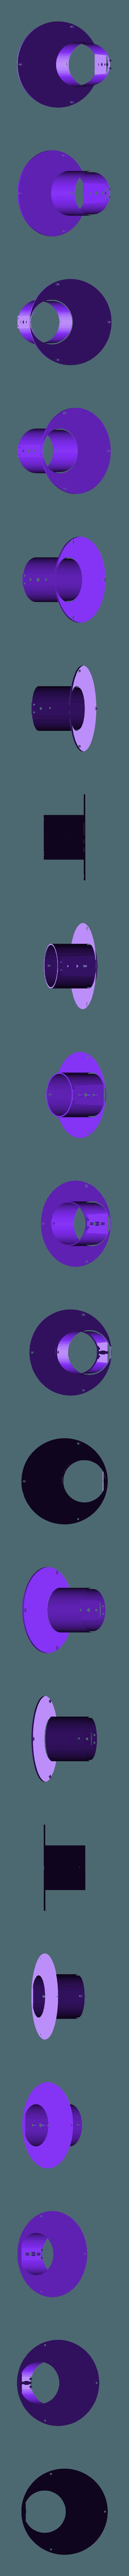 USB_Lamp_body.stl Download free STL file USB Desk Lamp • 3D printable model, Seabird